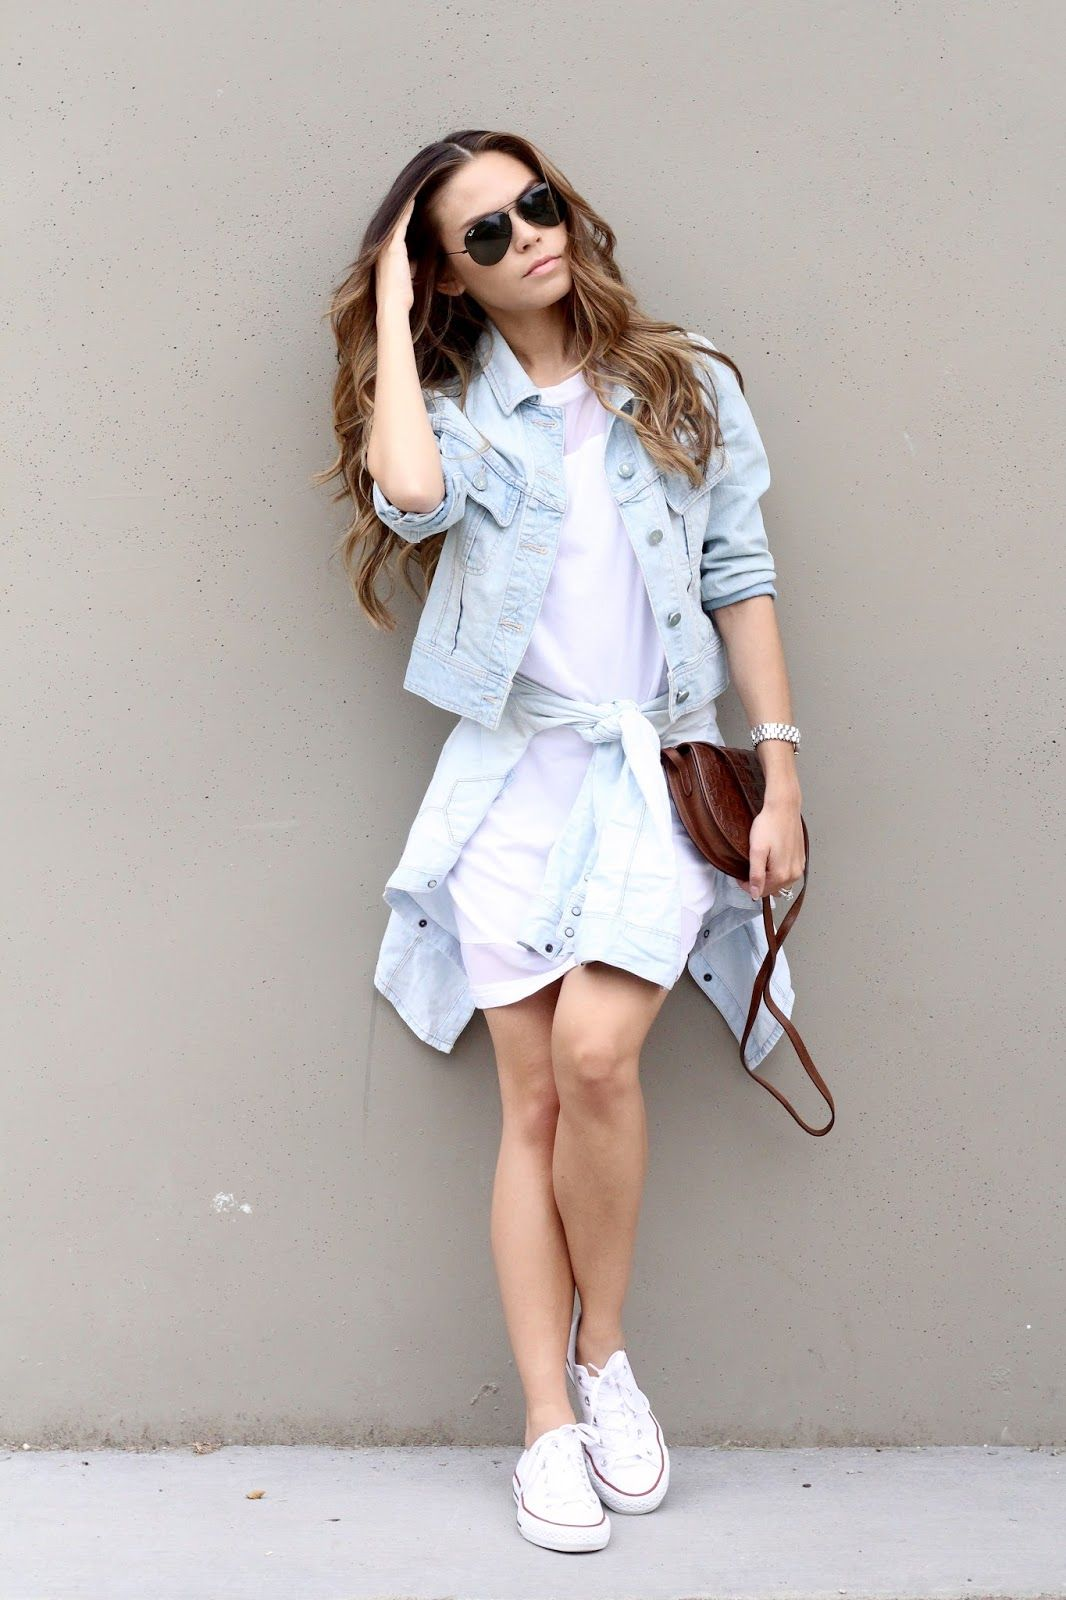 White t shirt dress outfit - Styling Denim Jacket White T Shirt Dress